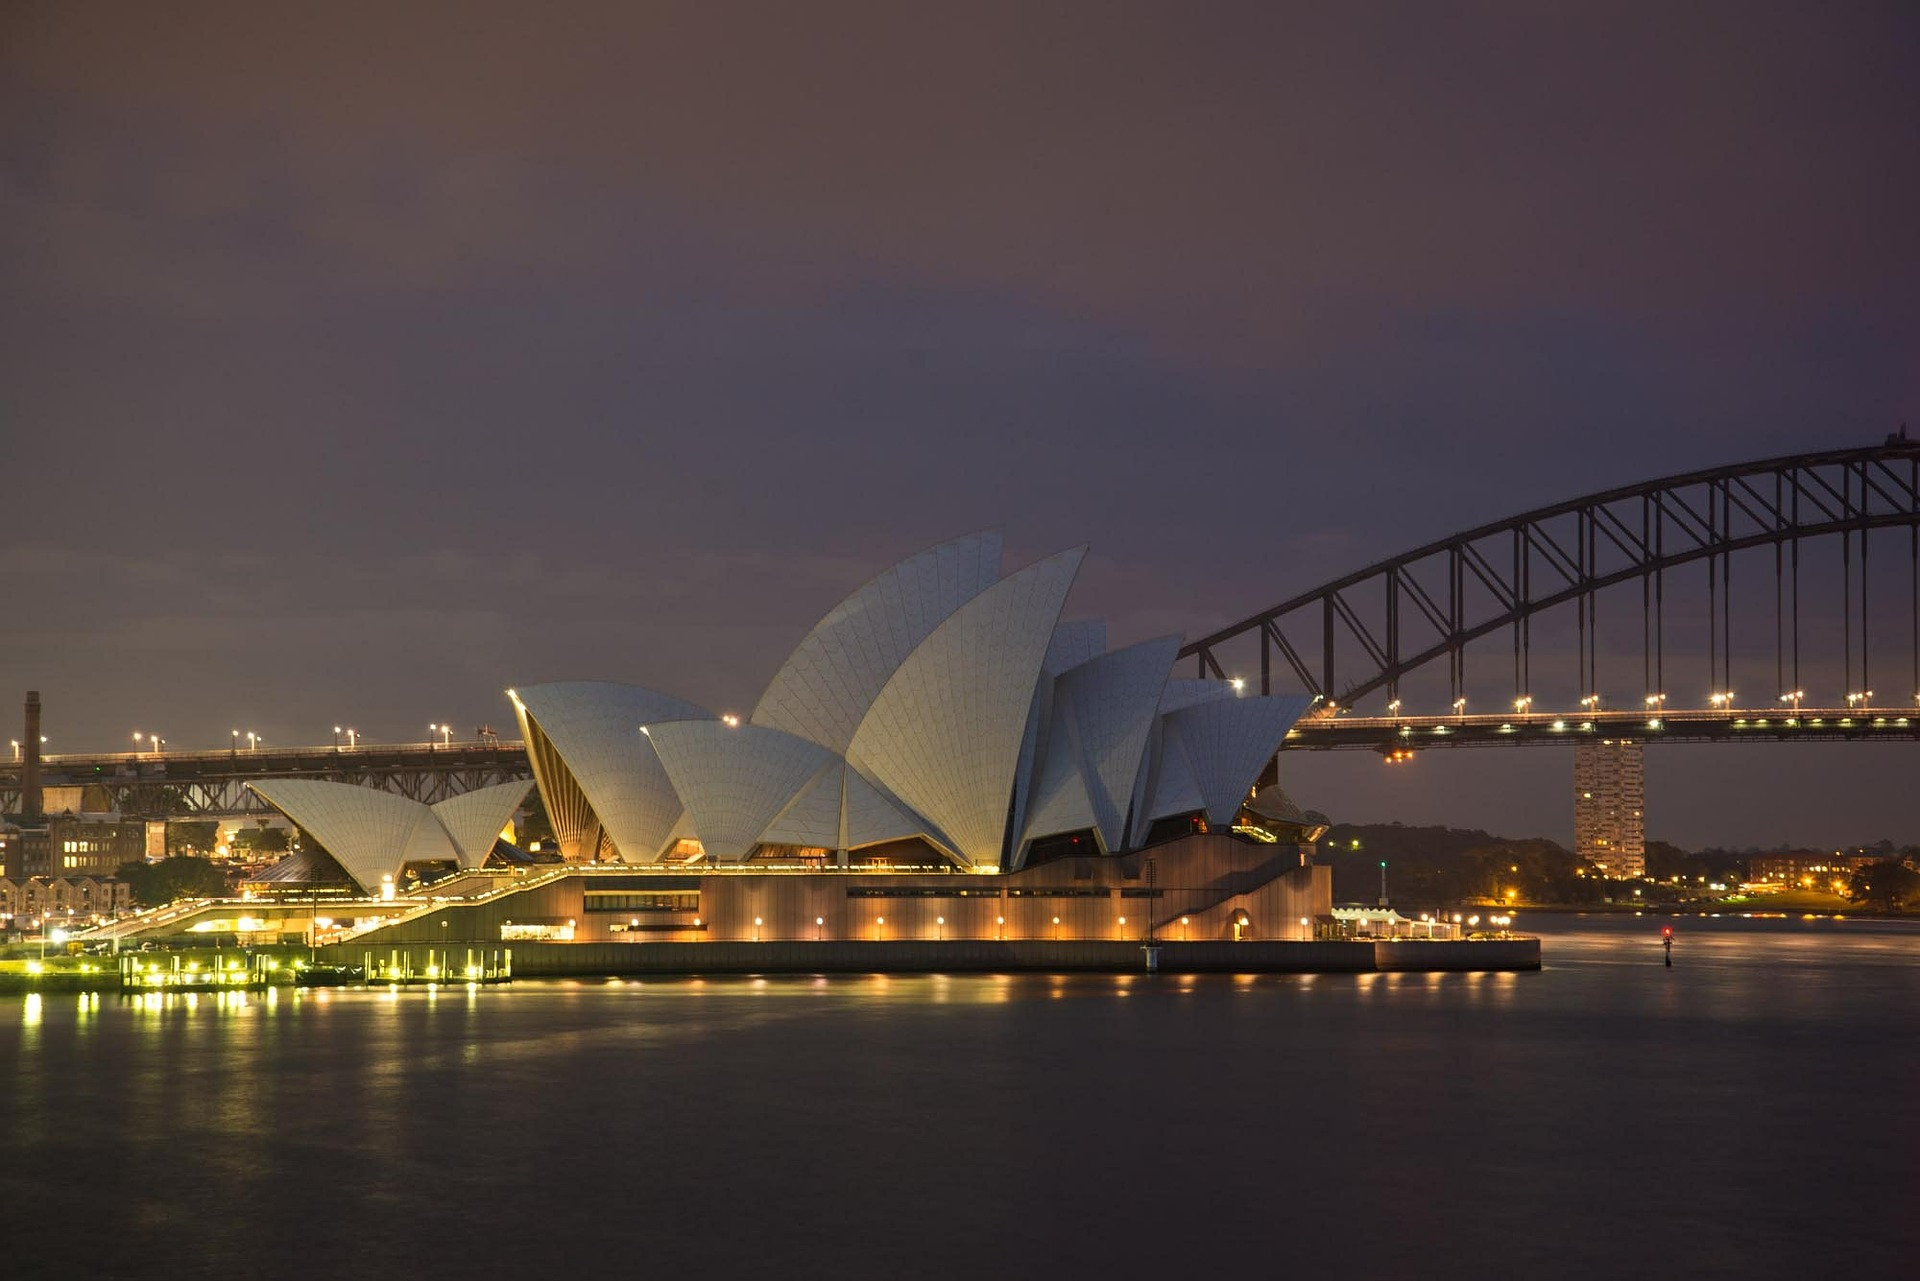 Sydney Opera House and the Sydney Harbour Bridge, Australia